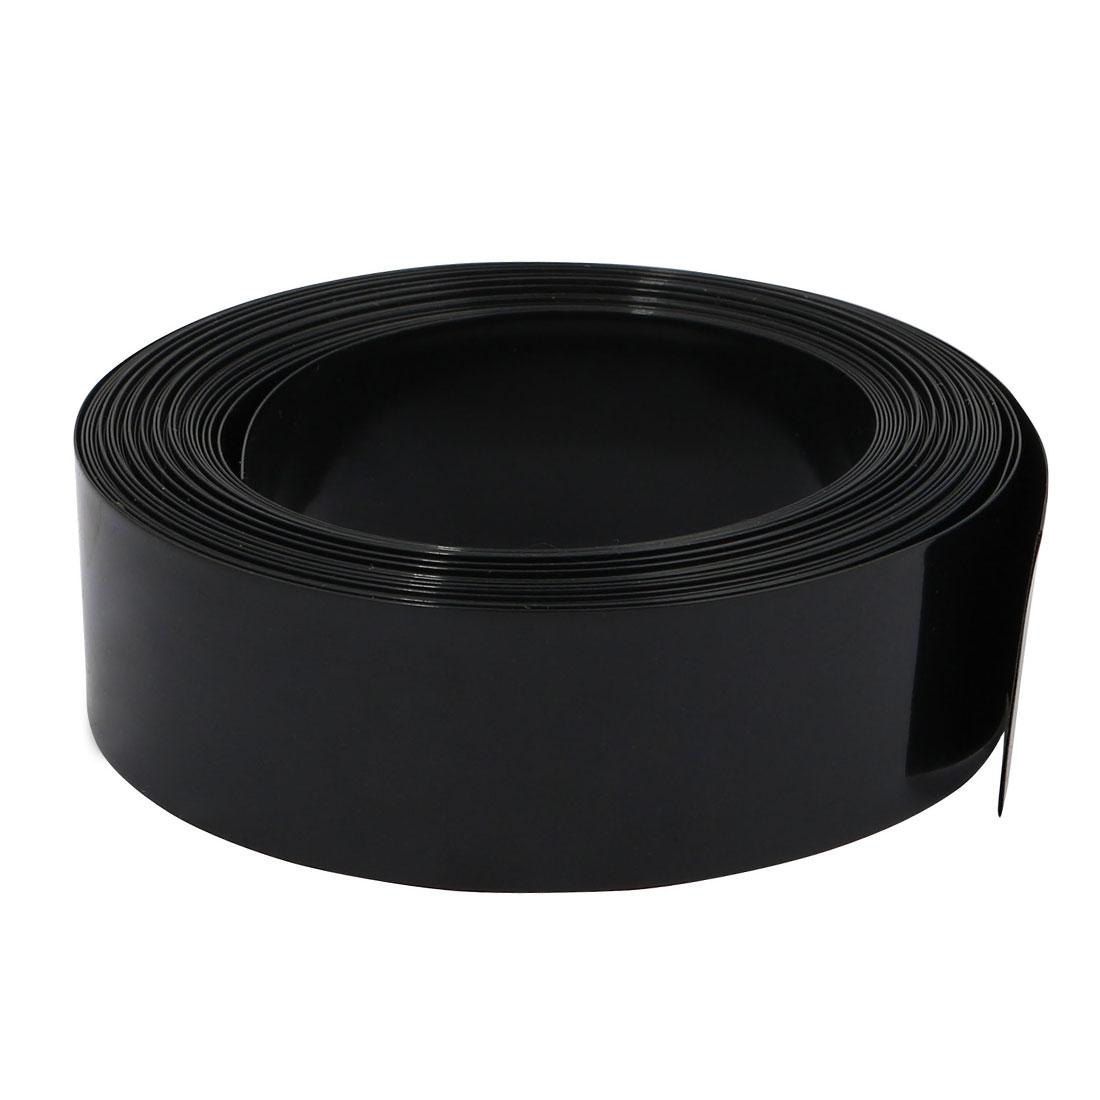 23mm Flat Width 6M Length PVC Heat Shrinkable Tube Black for AA Battery